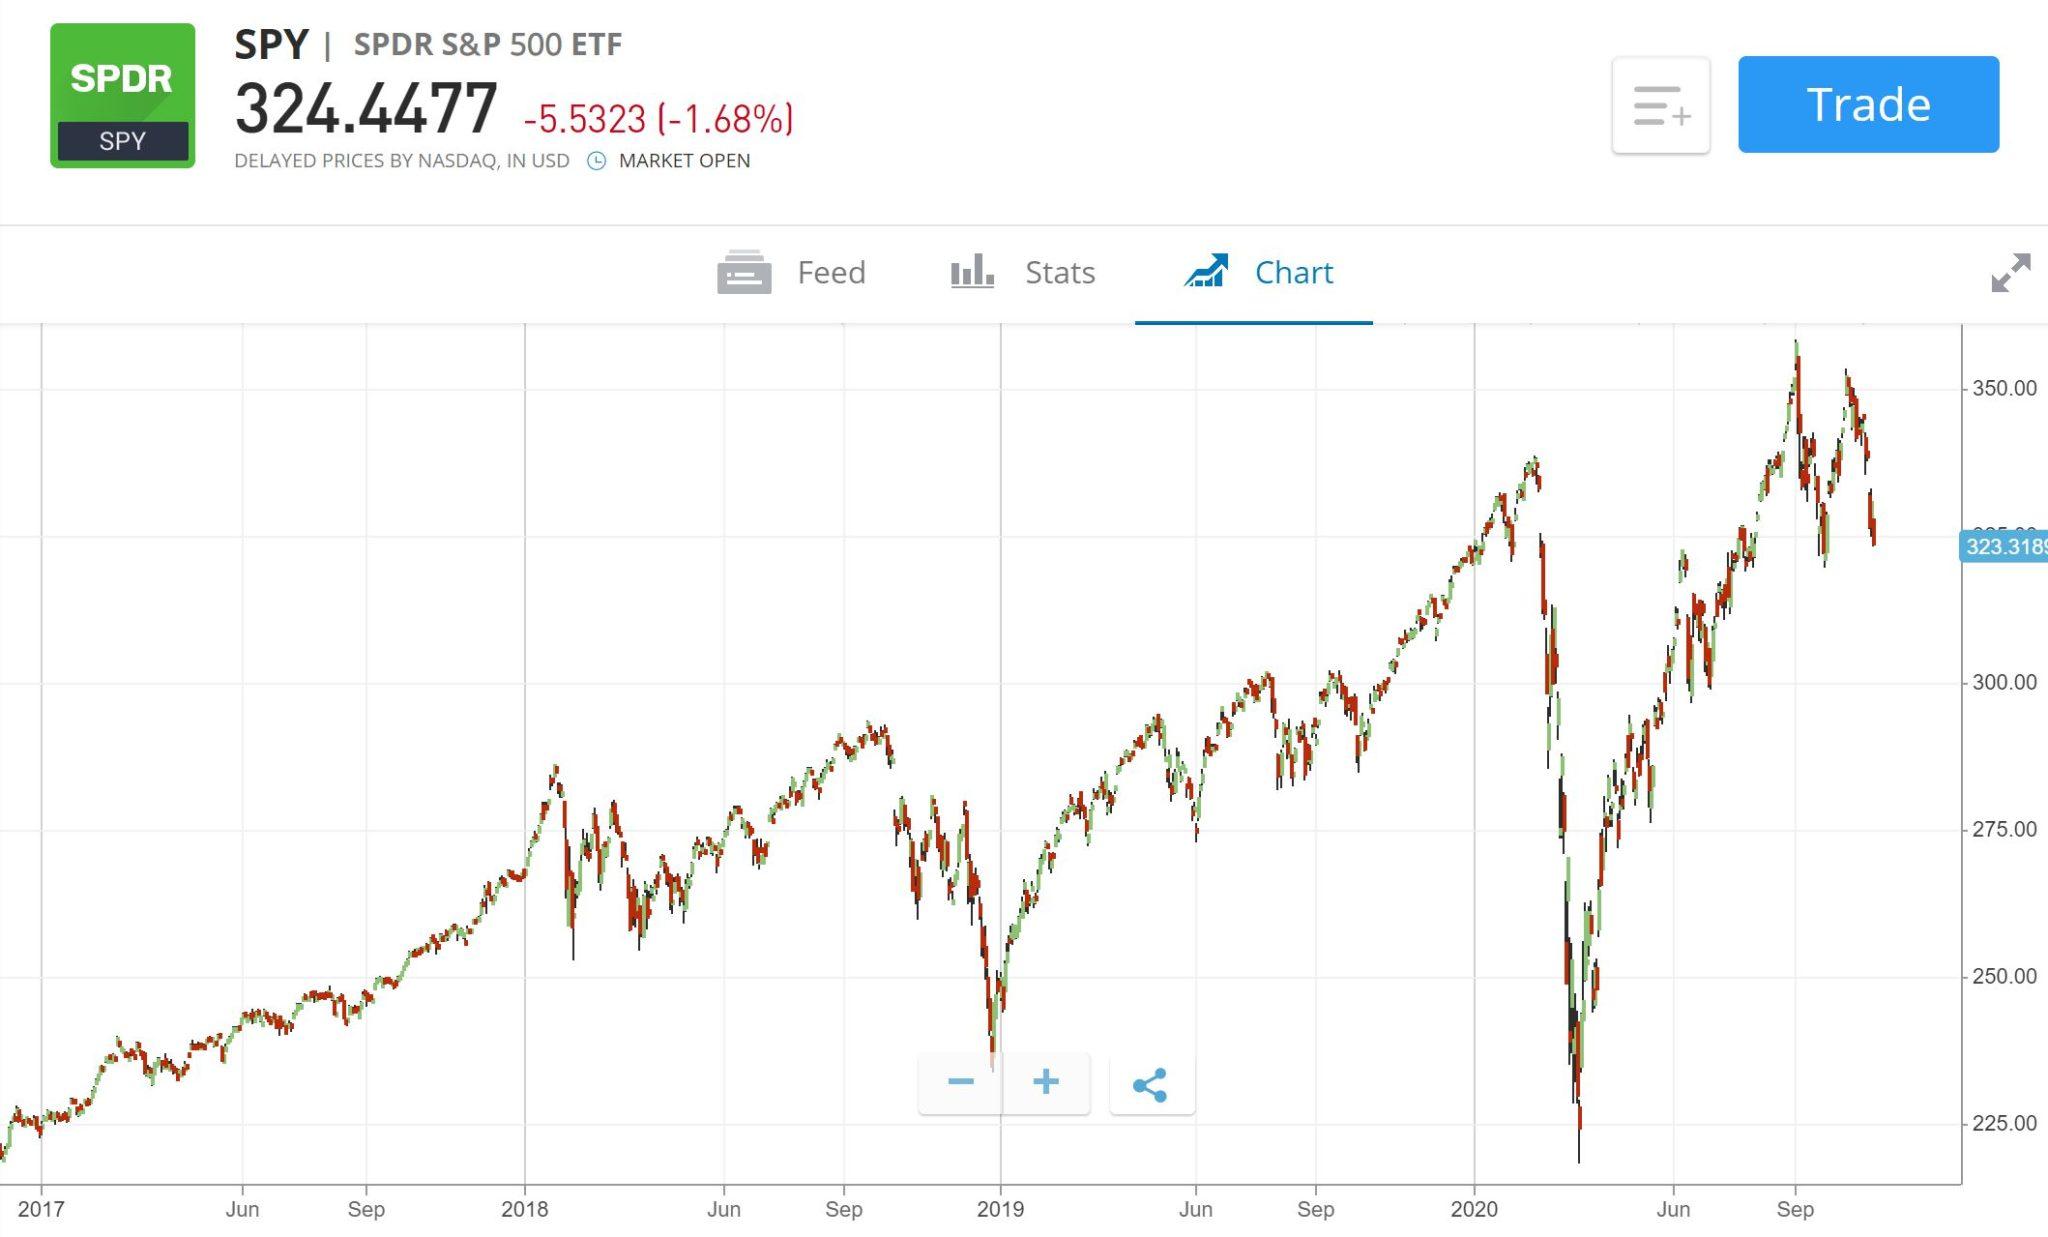 SPDR SPY S&P 500 price chart